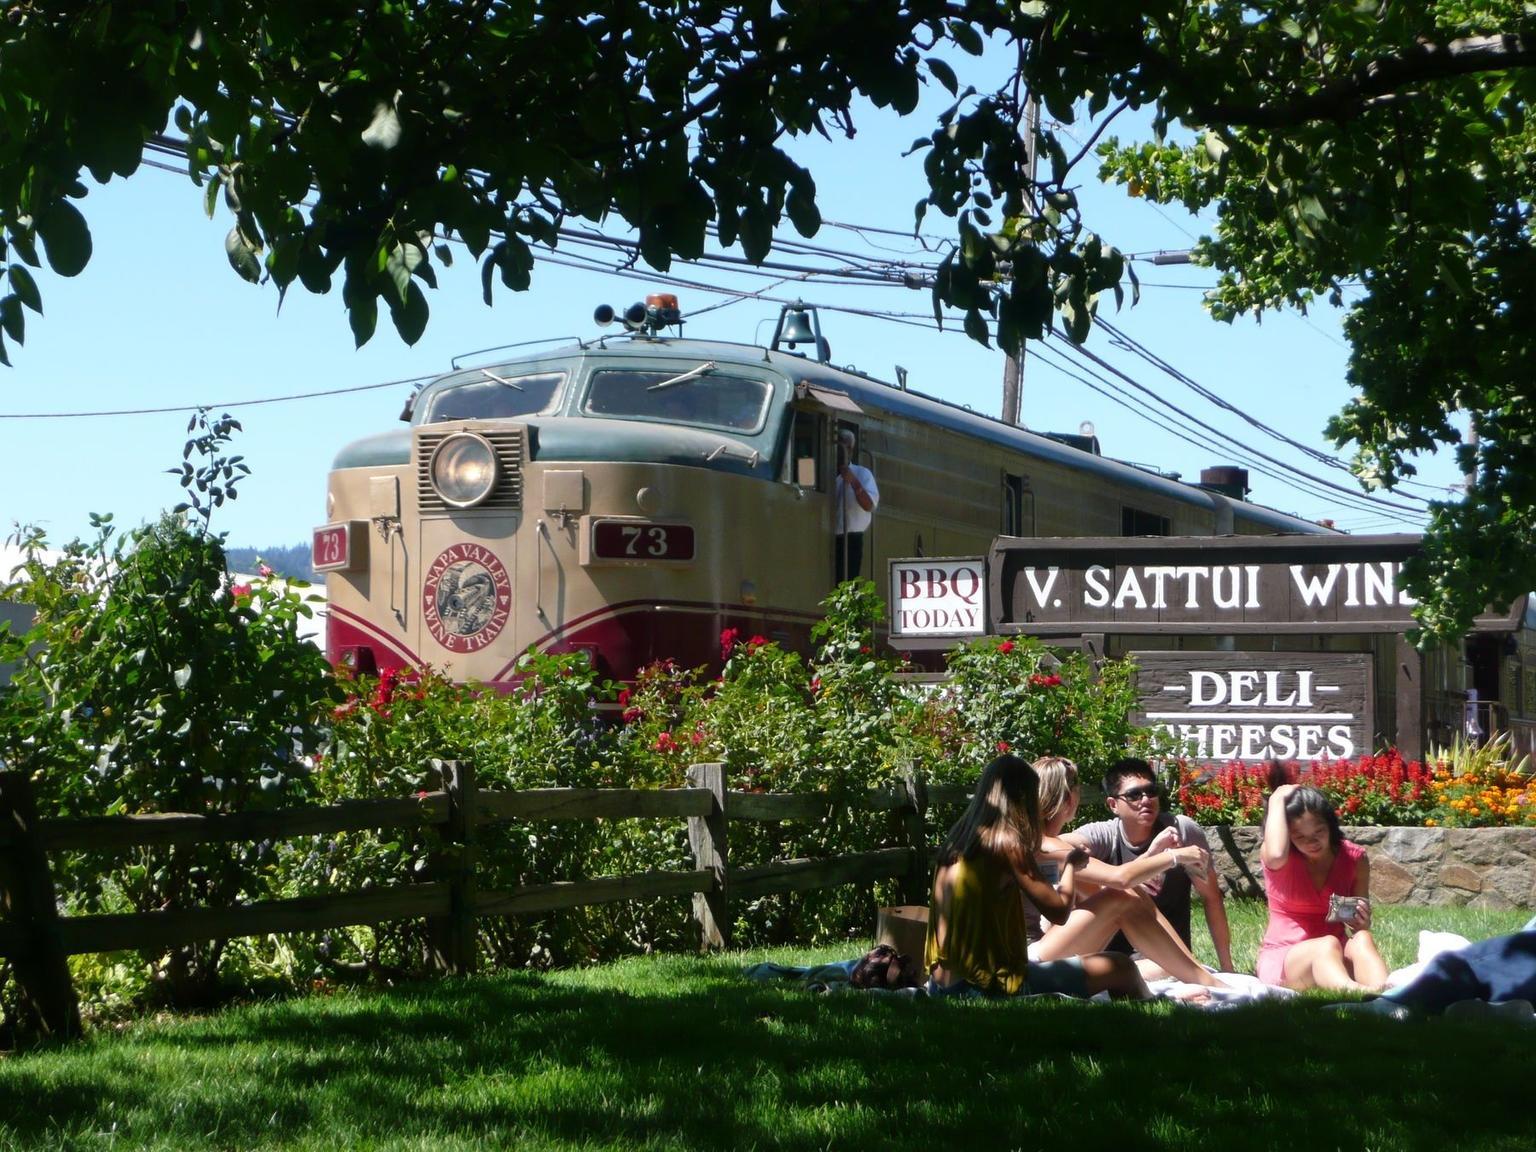 V. Sattu Winery